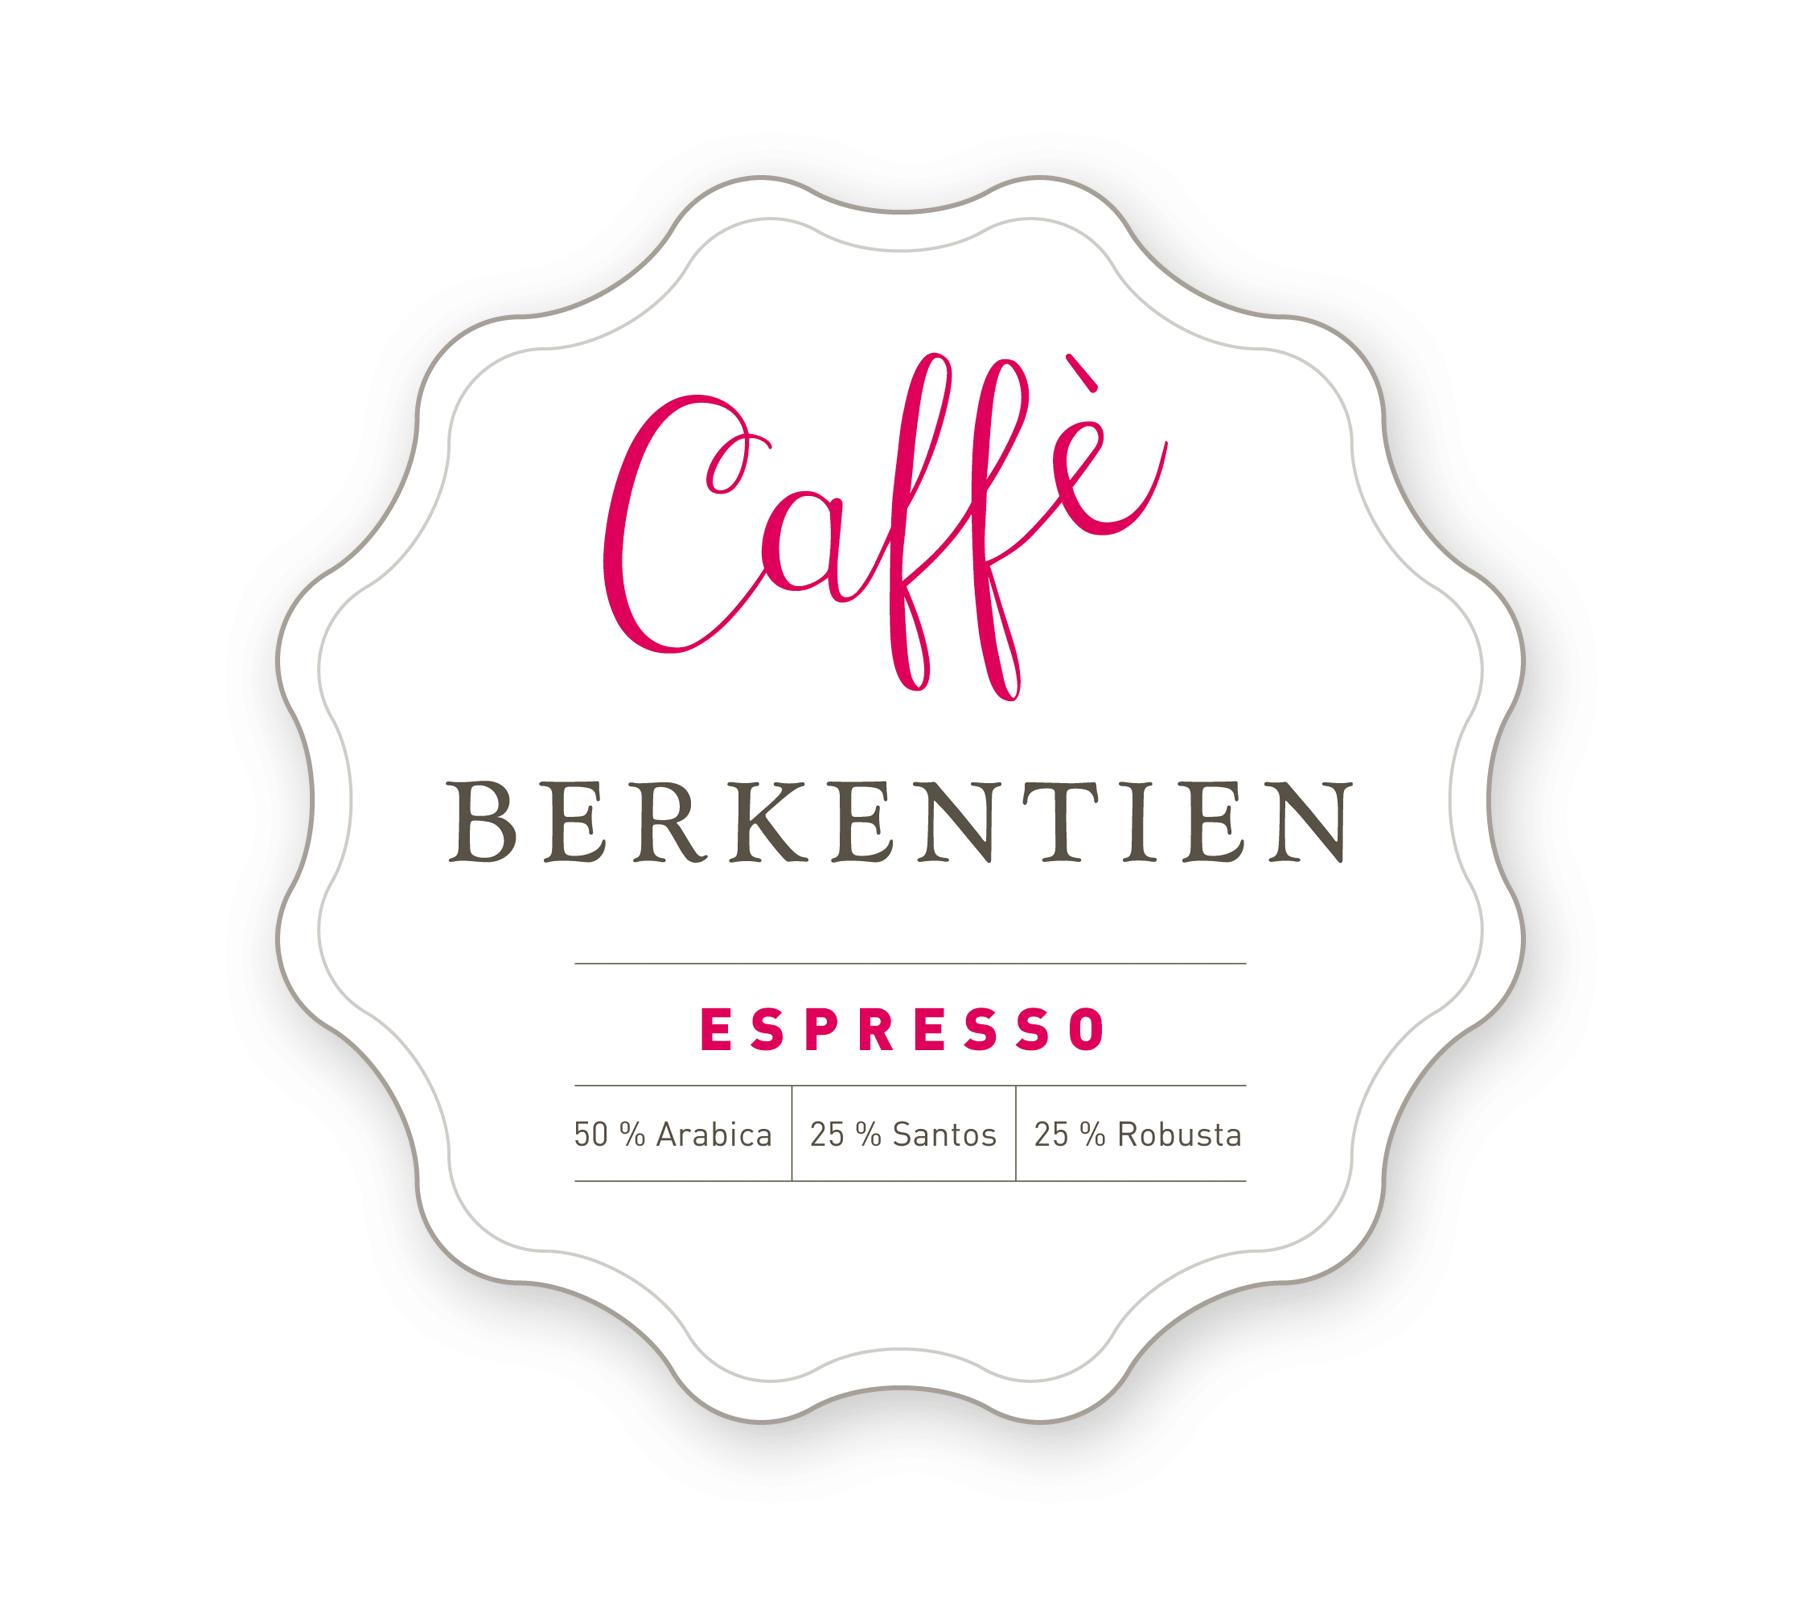 Caffè Berkentien - Espresso - Hausmischung aus der Toskana